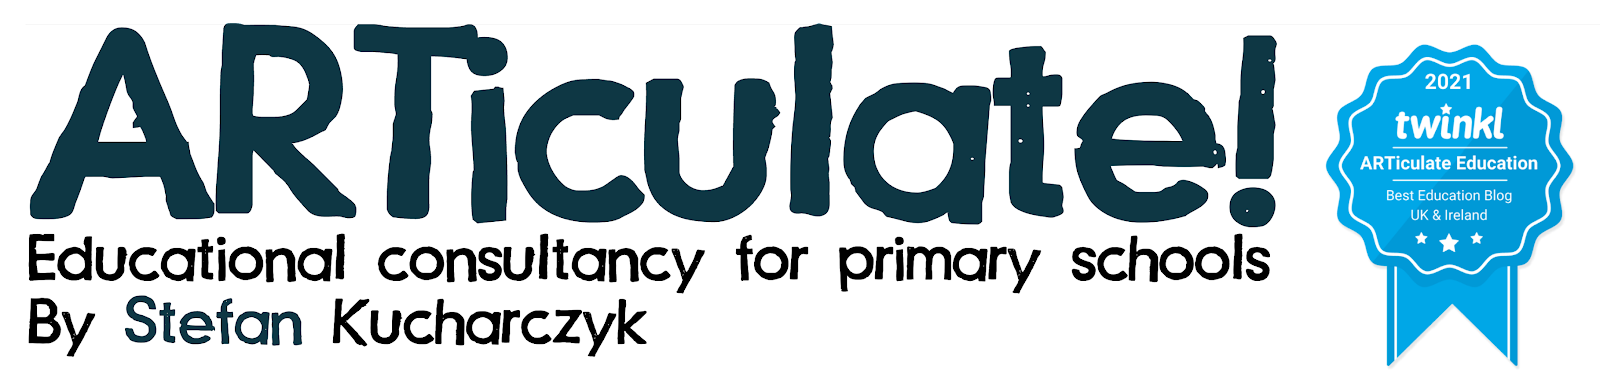 Articulate Education UK